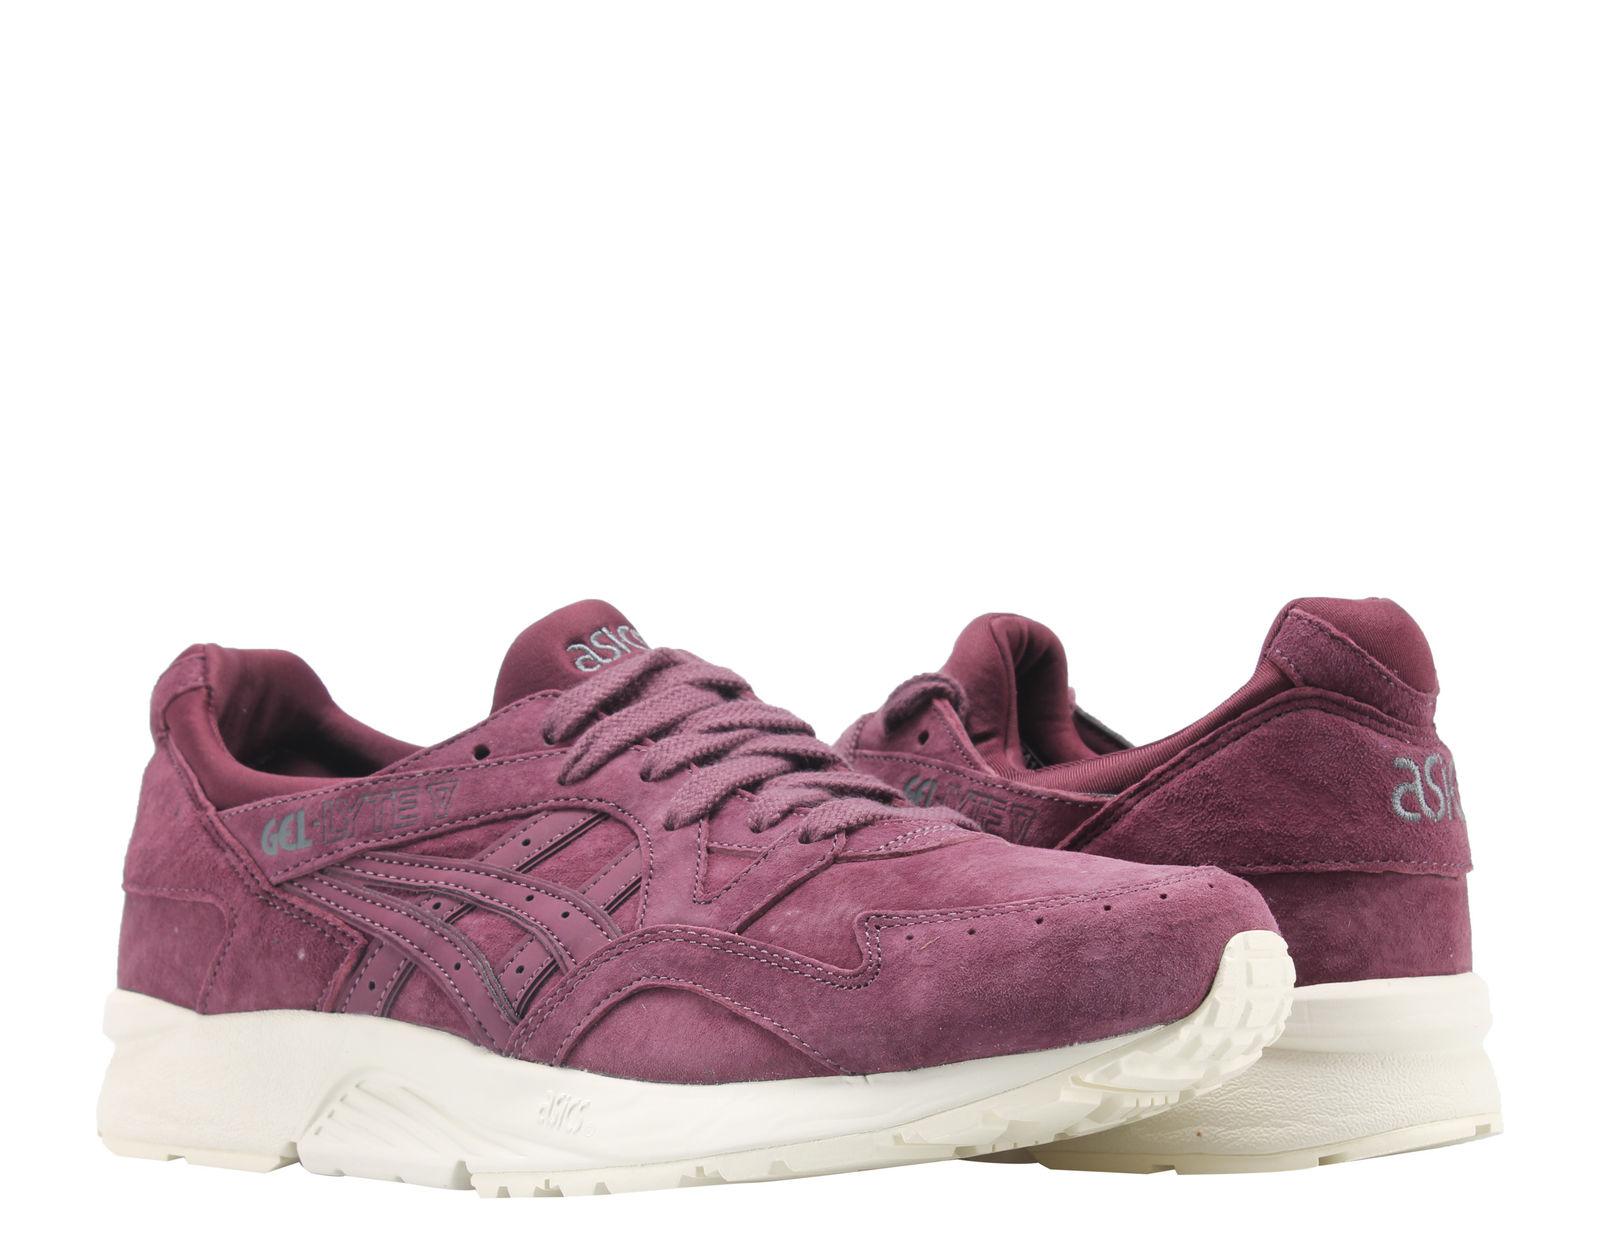 f5cbba2e6ee3 ASICS Hl7a1 3333 GEL Lyte V Eggplant Purple Men s Casual Shoes Size 6 US